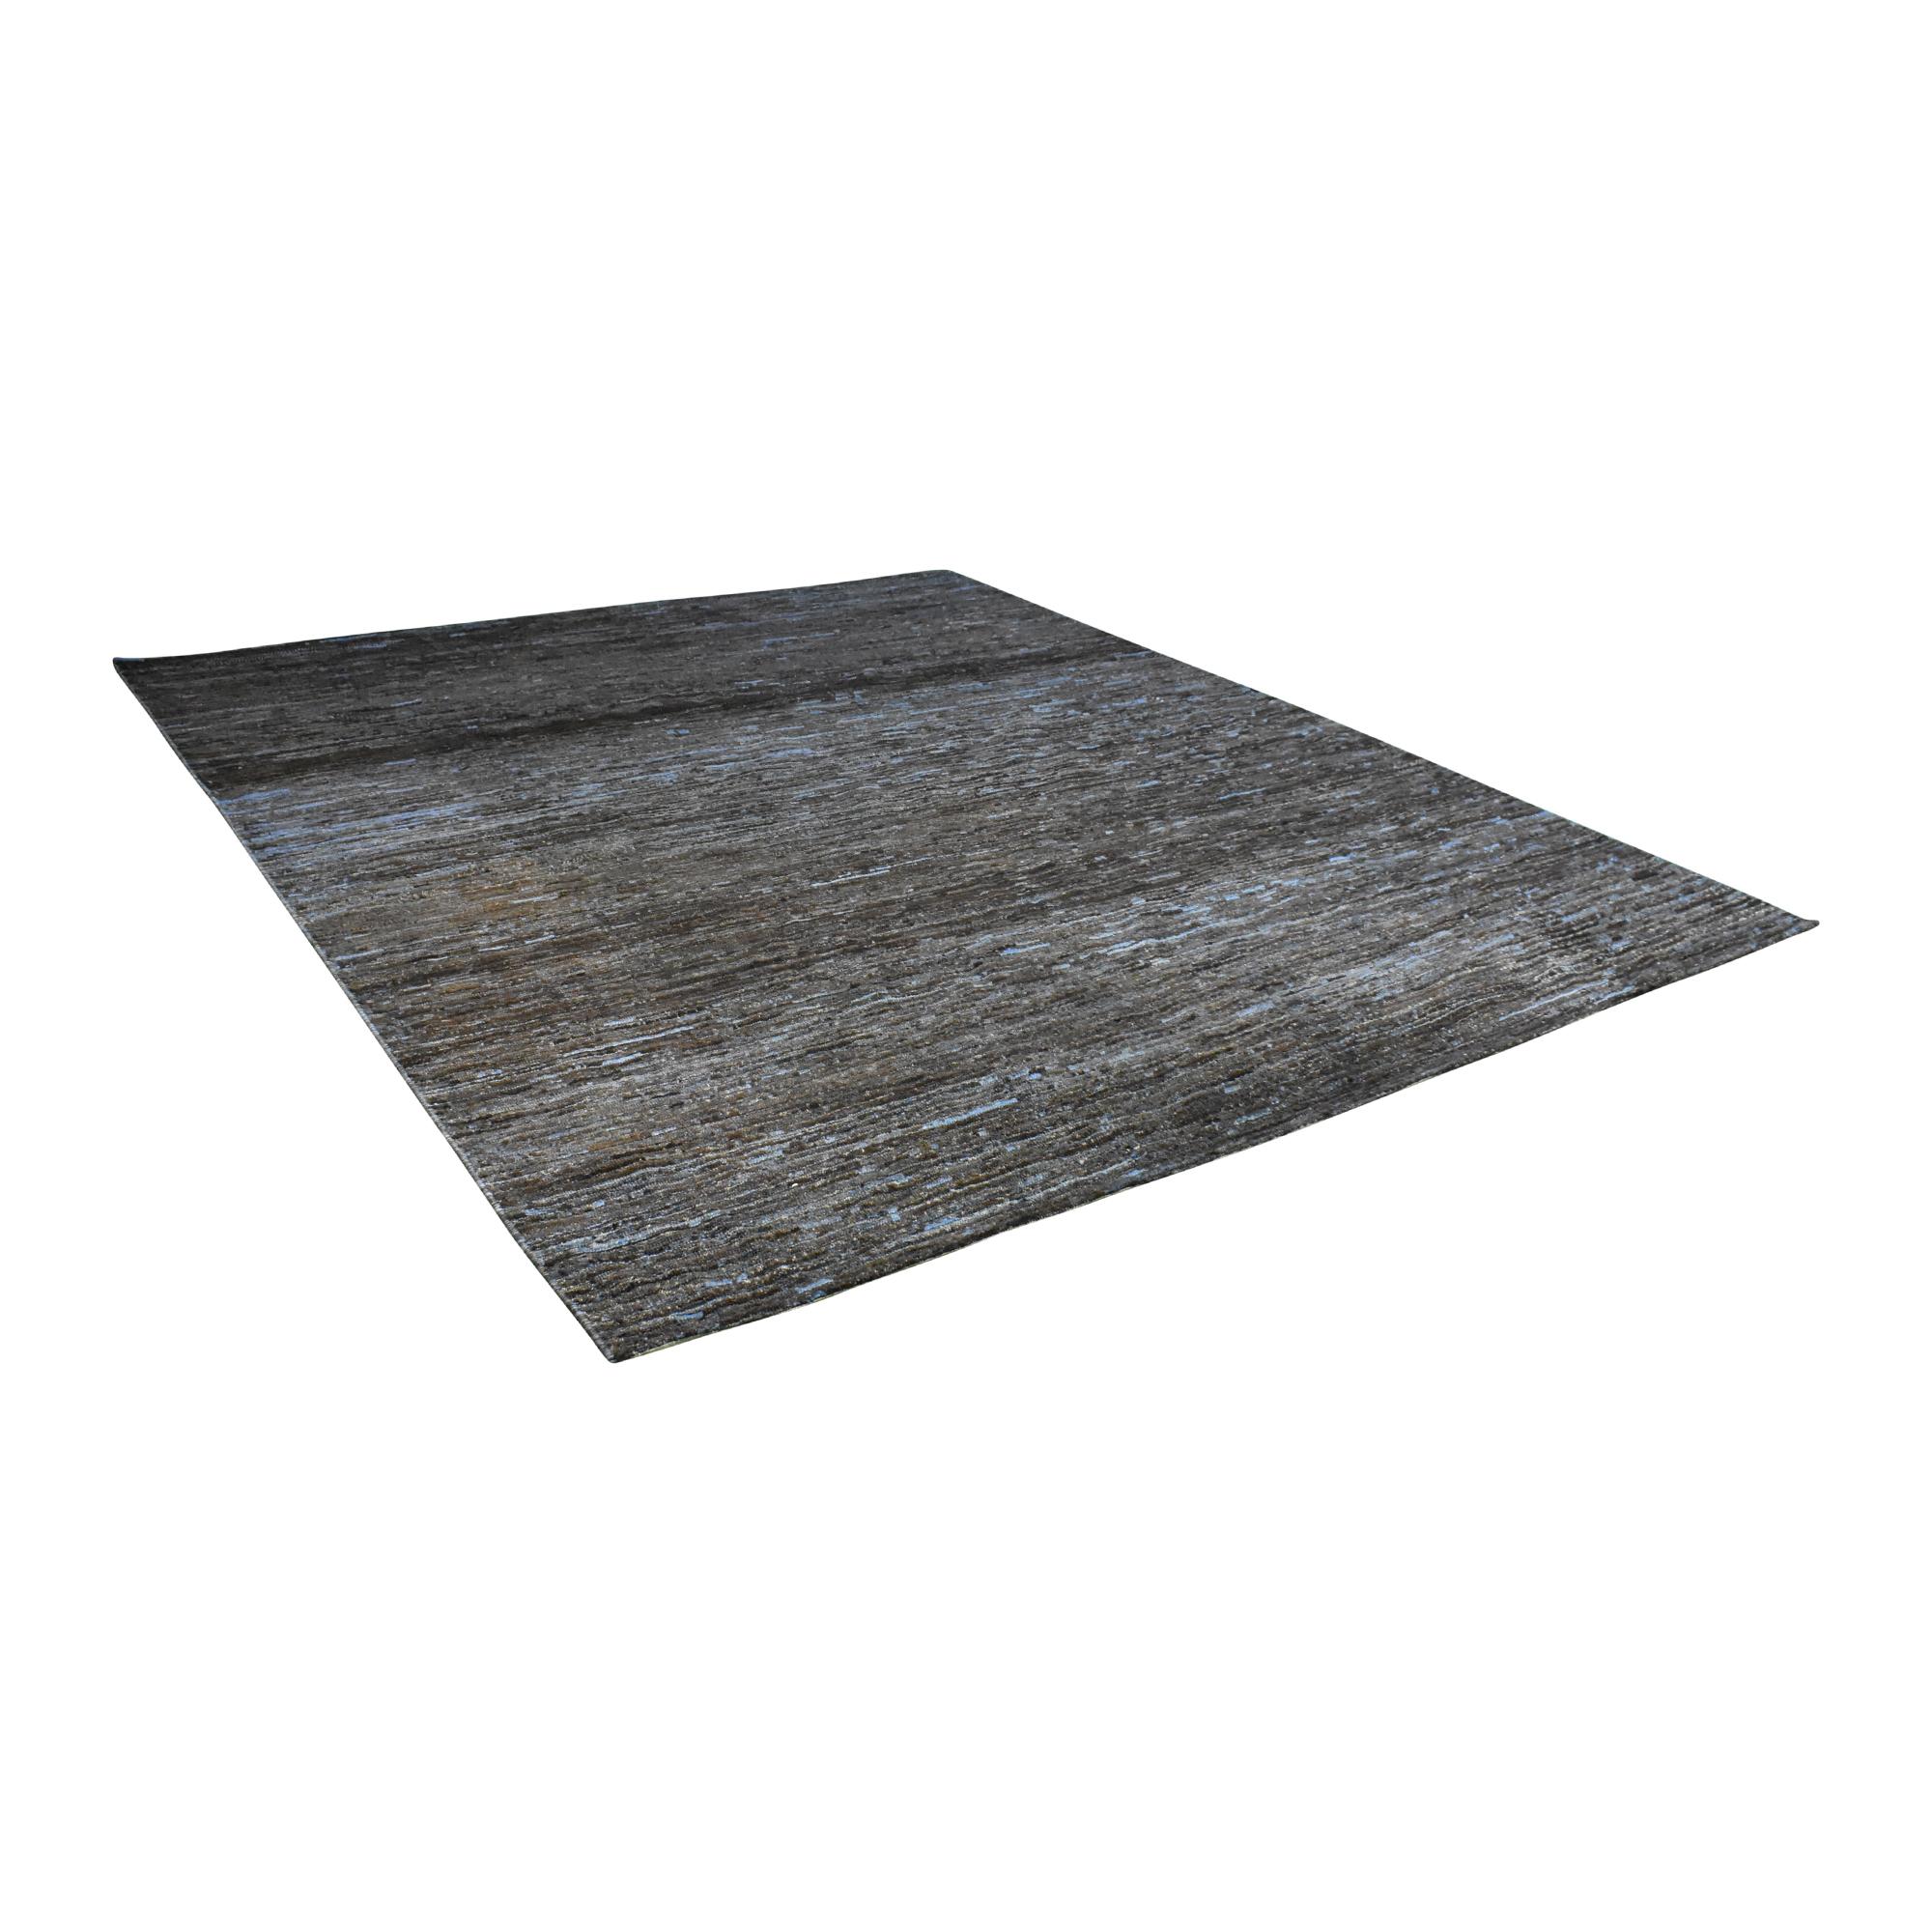 buy ABC Carpet & Home Area Rug ABC Carpet & Home Rugs